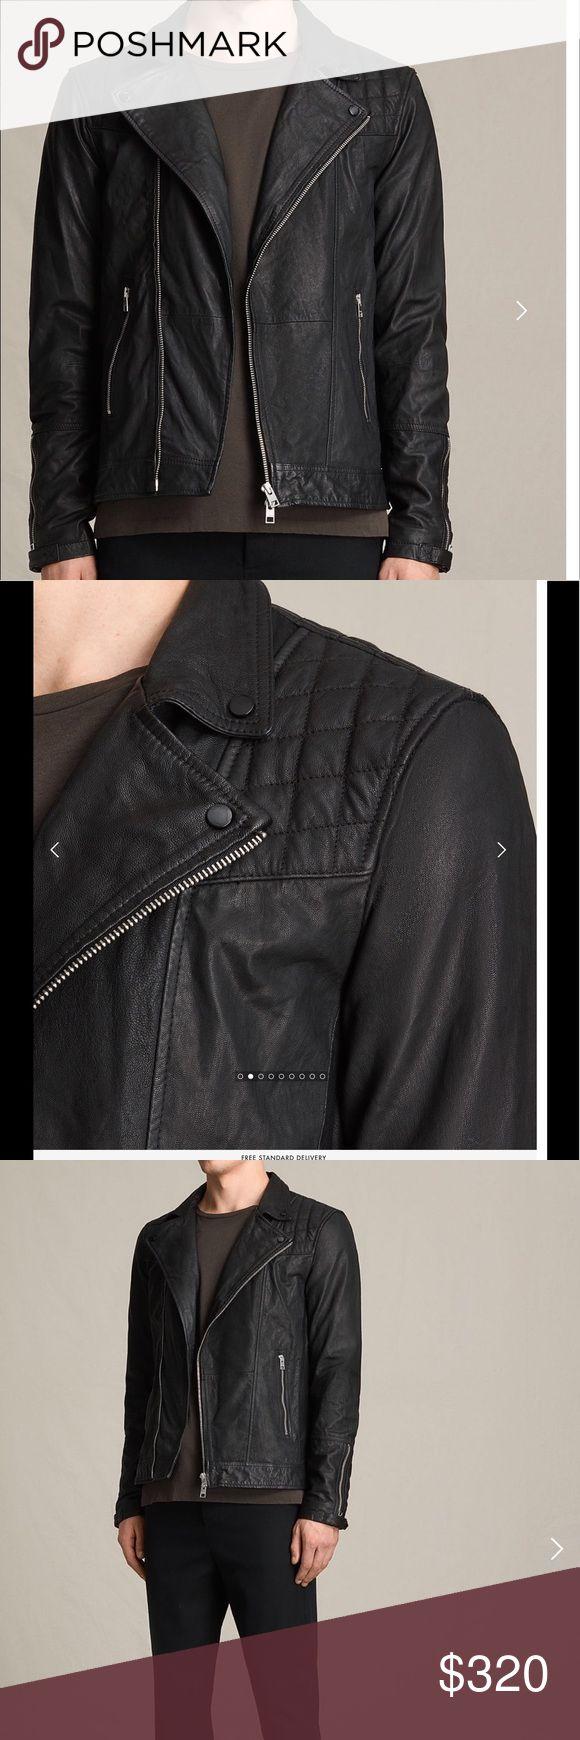 All Saints Kushiro Leather Biker Jacket - Medium All Saints Kushiro Leather Biker Jacket - Medium. Worn twice and looks brand new All Saints Jackets & Coats